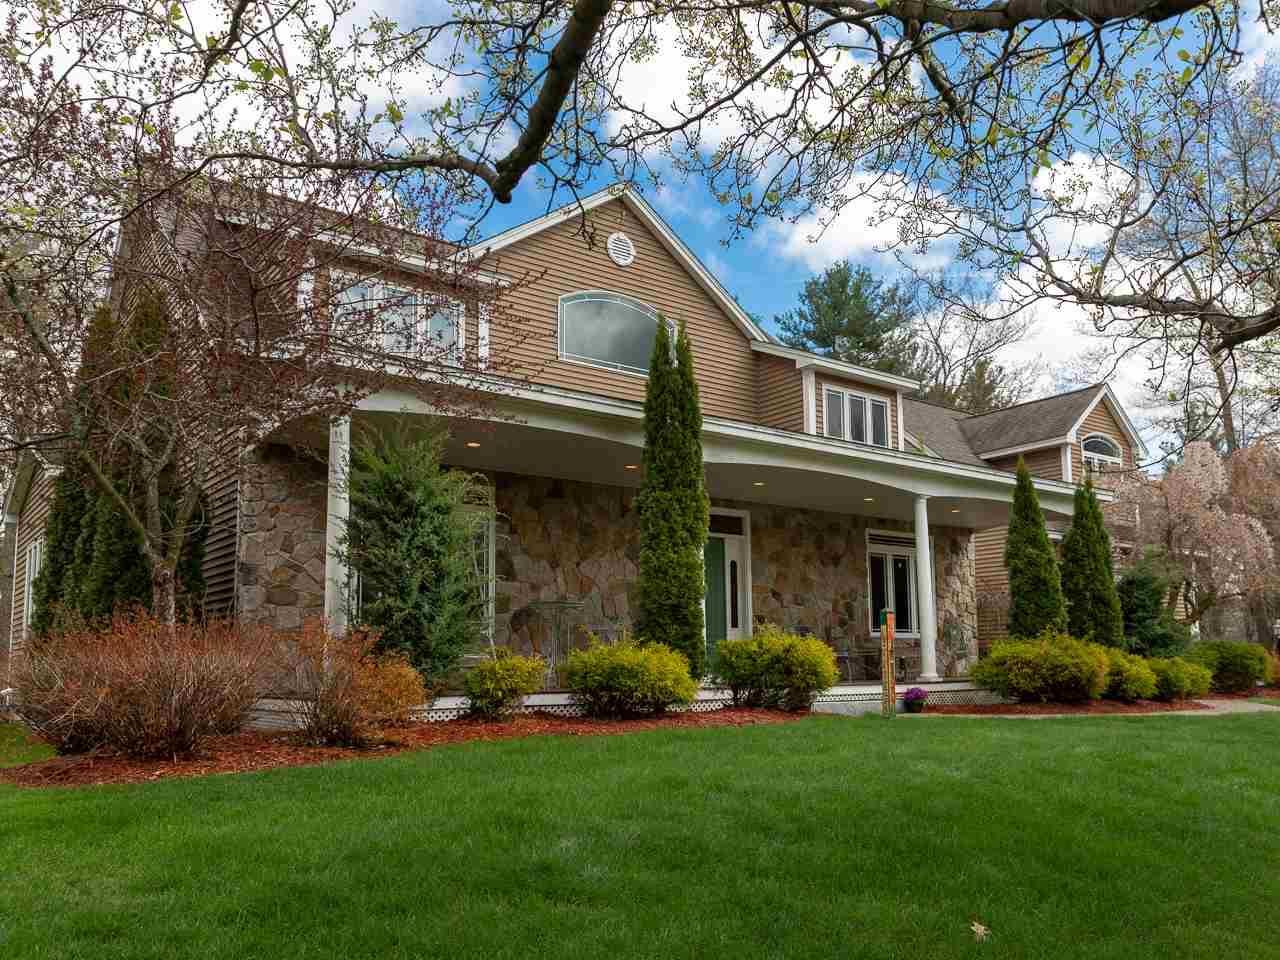 Berkley & Veller Greenwood Country Realtors